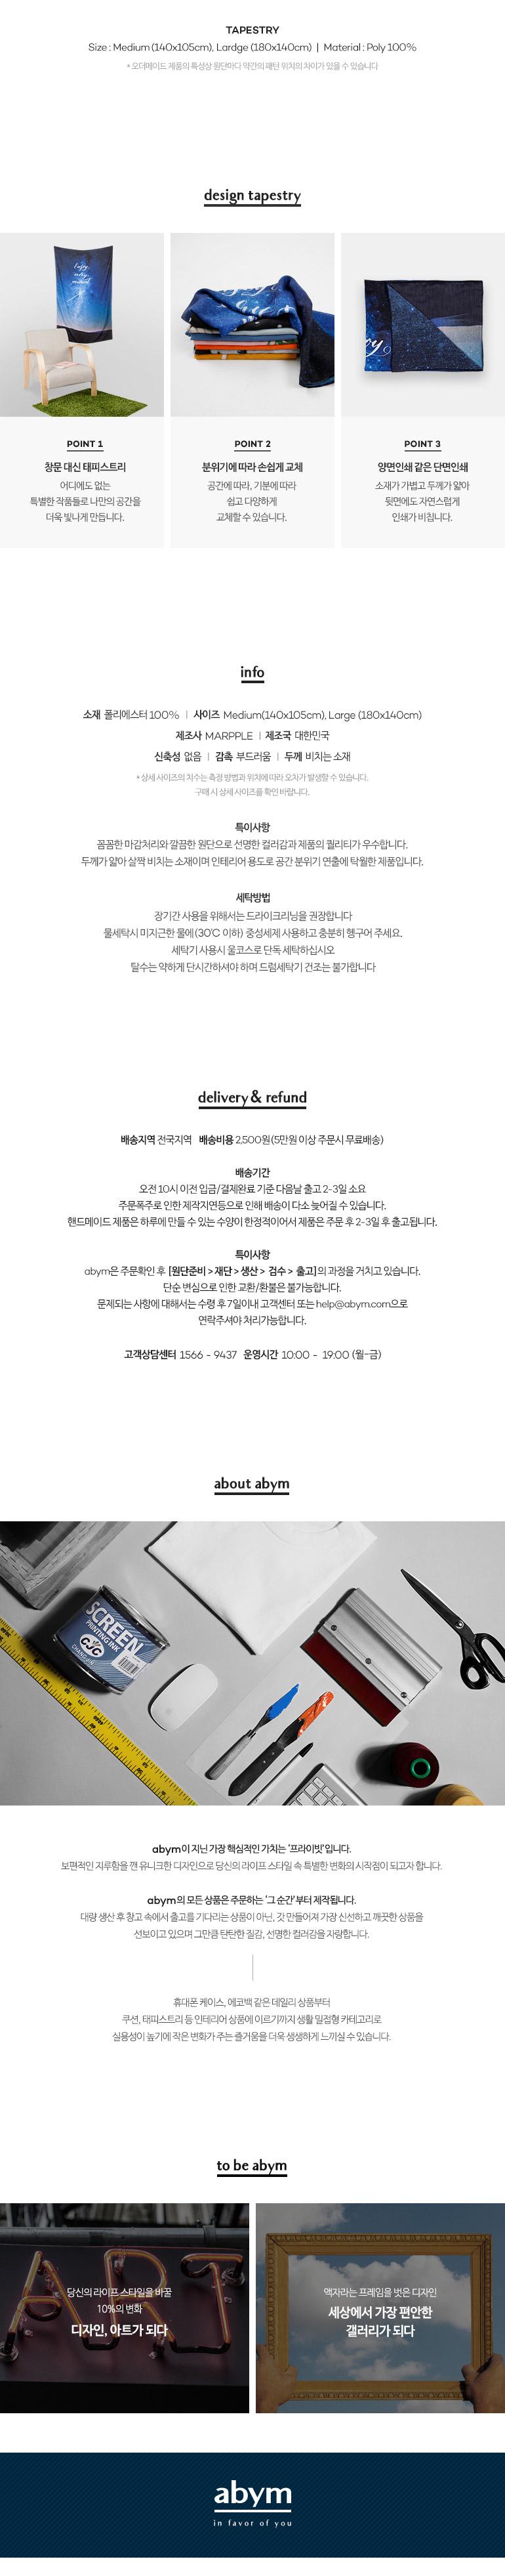 white stone 태피스트리 - 에이바이엠, 29,000원, 벽장식, 앤틱 벽장식